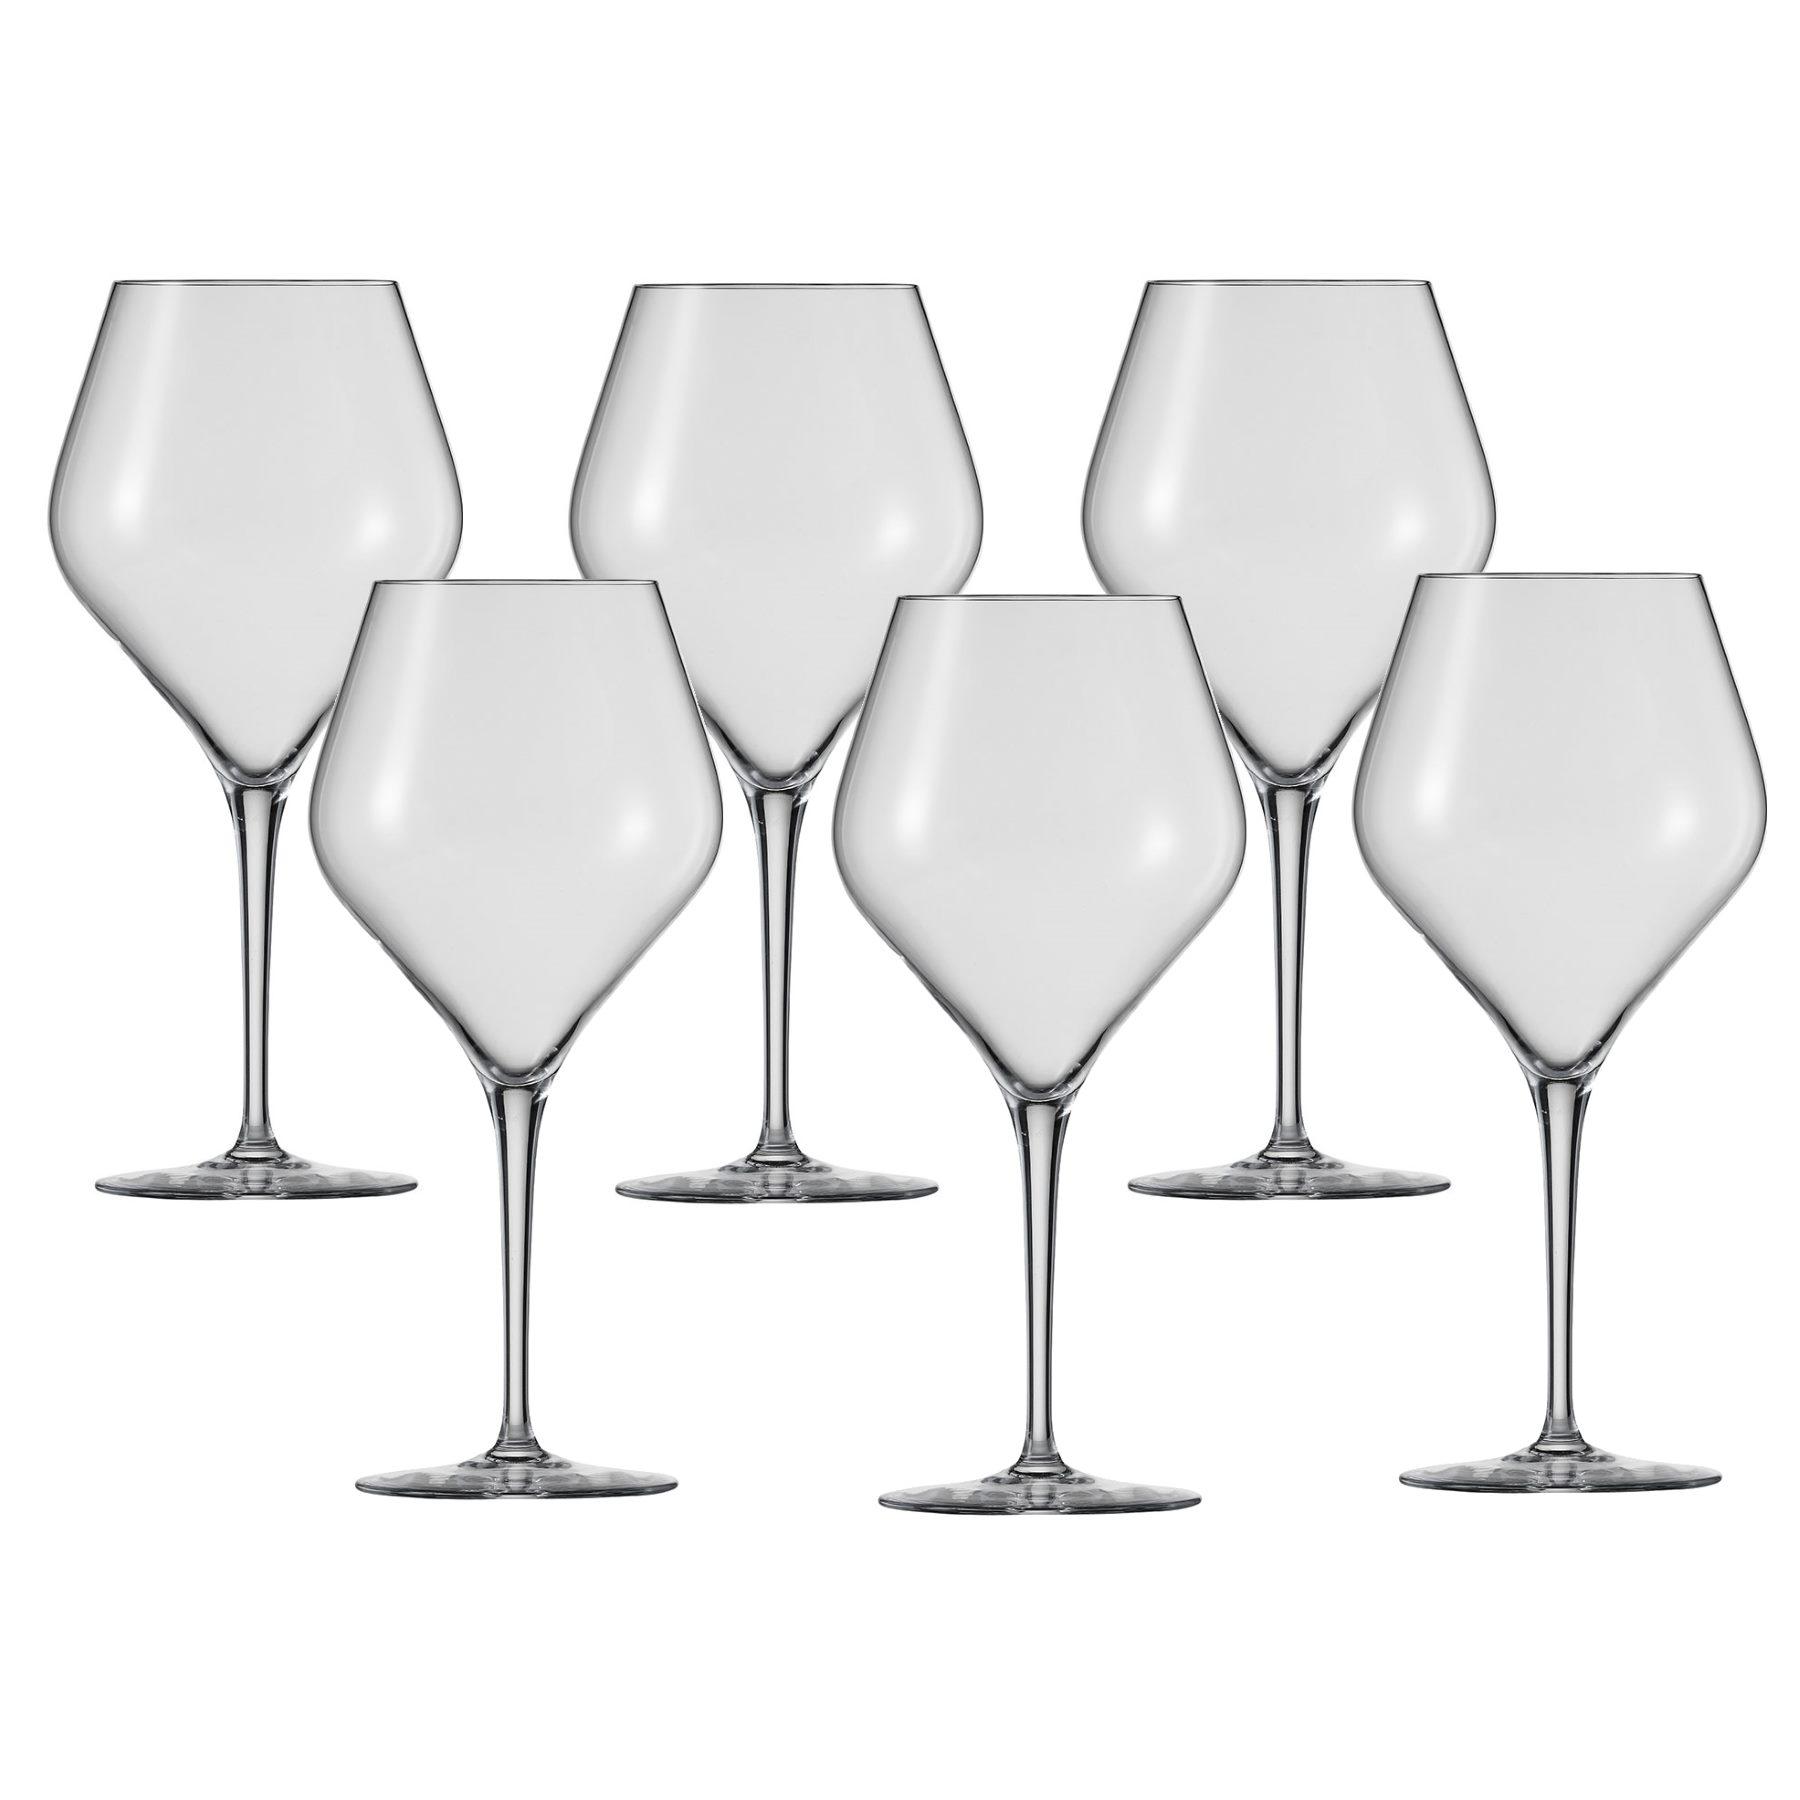 schott zwiesel serie finesse burgunderglas 6 st ck rotweingl ser gl ser essen trinken. Black Bedroom Furniture Sets. Home Design Ideas